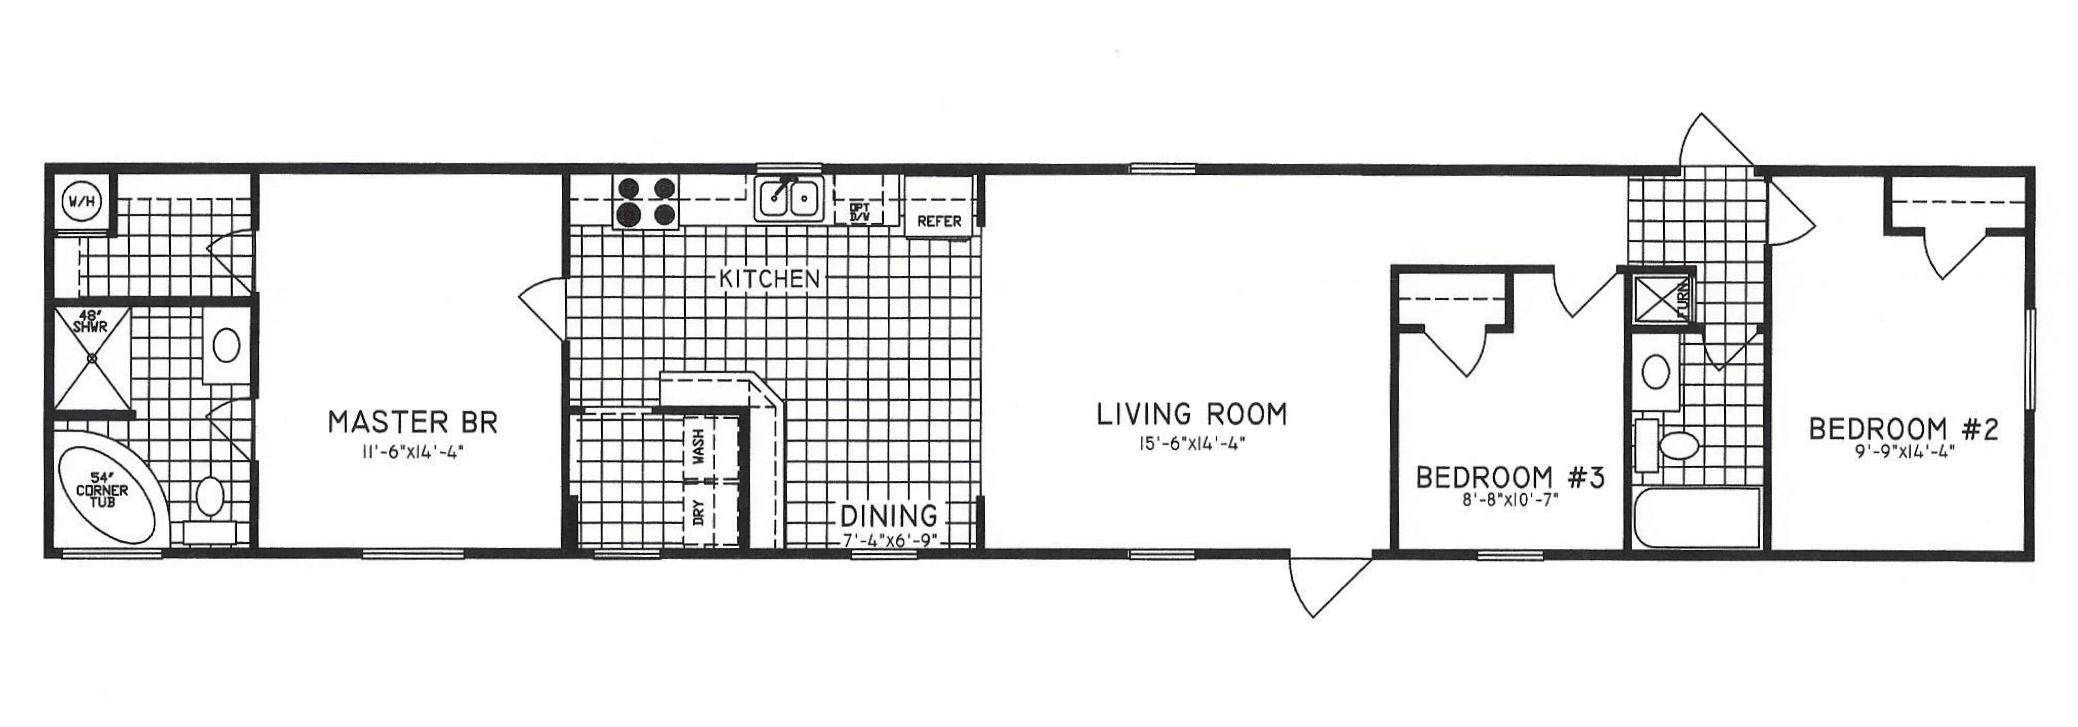 C 9719 hawks homes manufactured modular conway 3 bedroom modular home floor plans